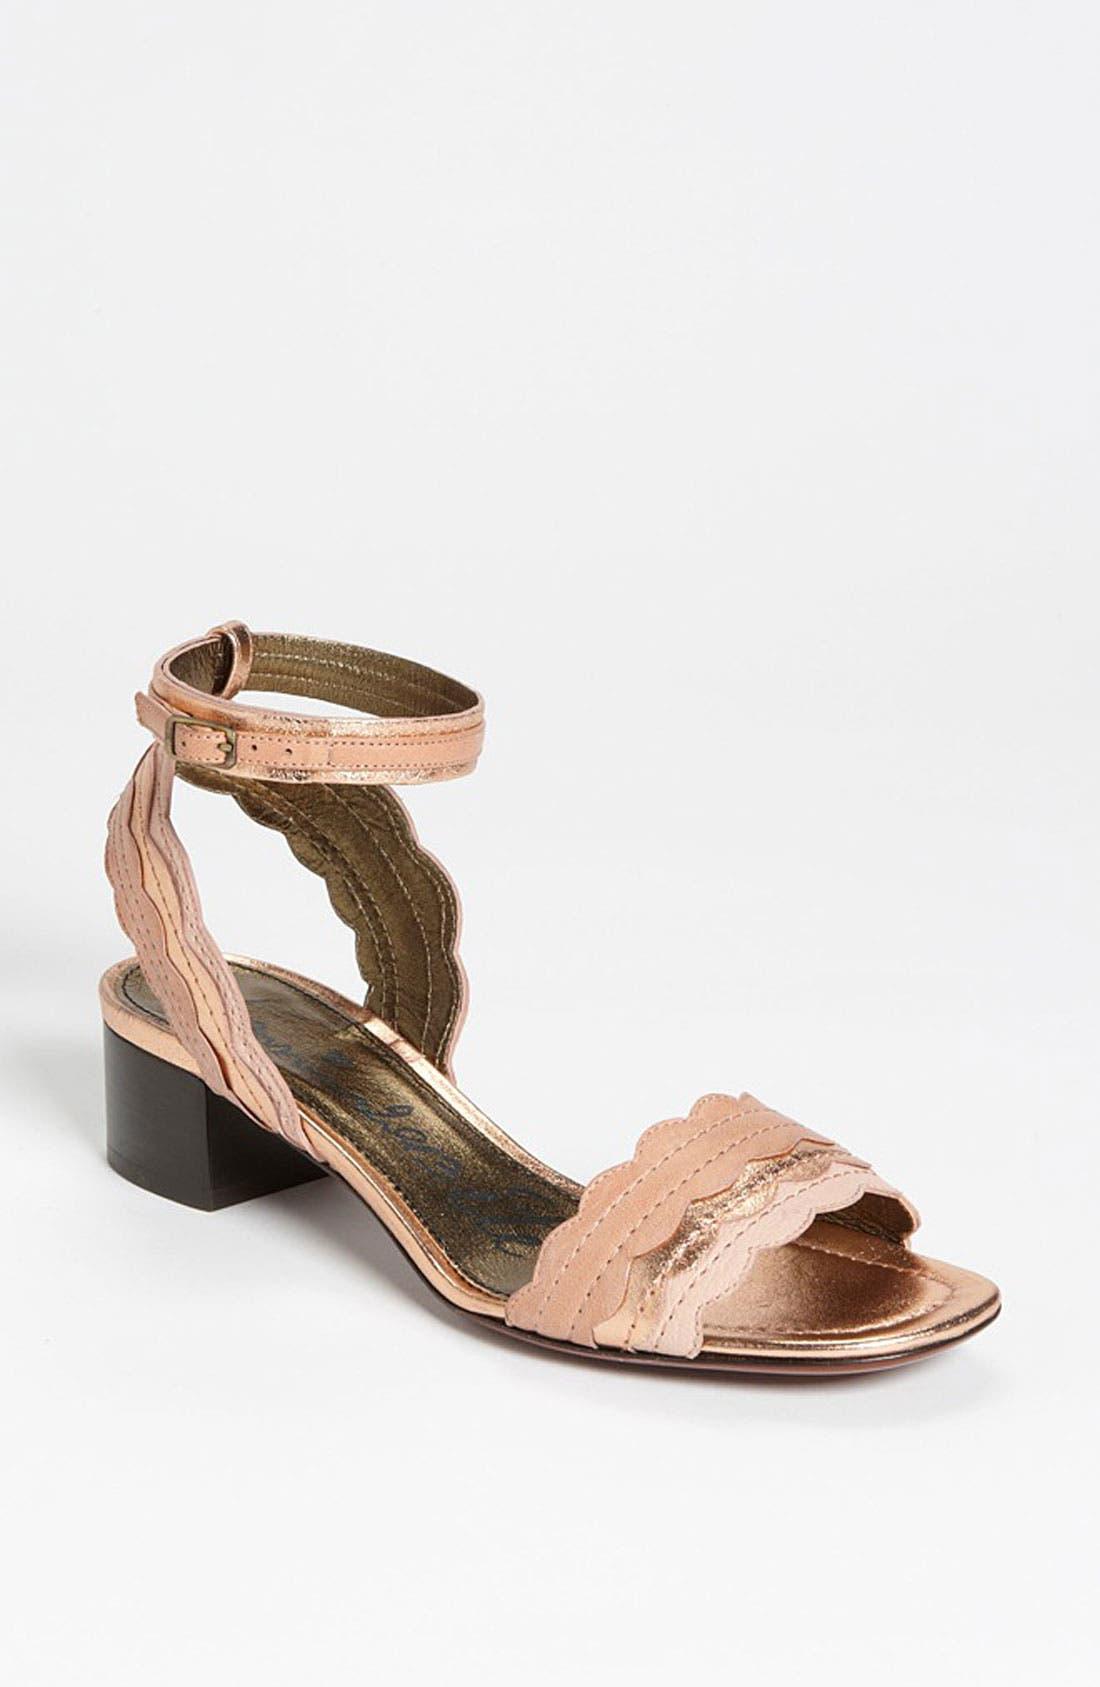 Alternate Image 1 Selected - Lanvin 'Chunky' Sandal